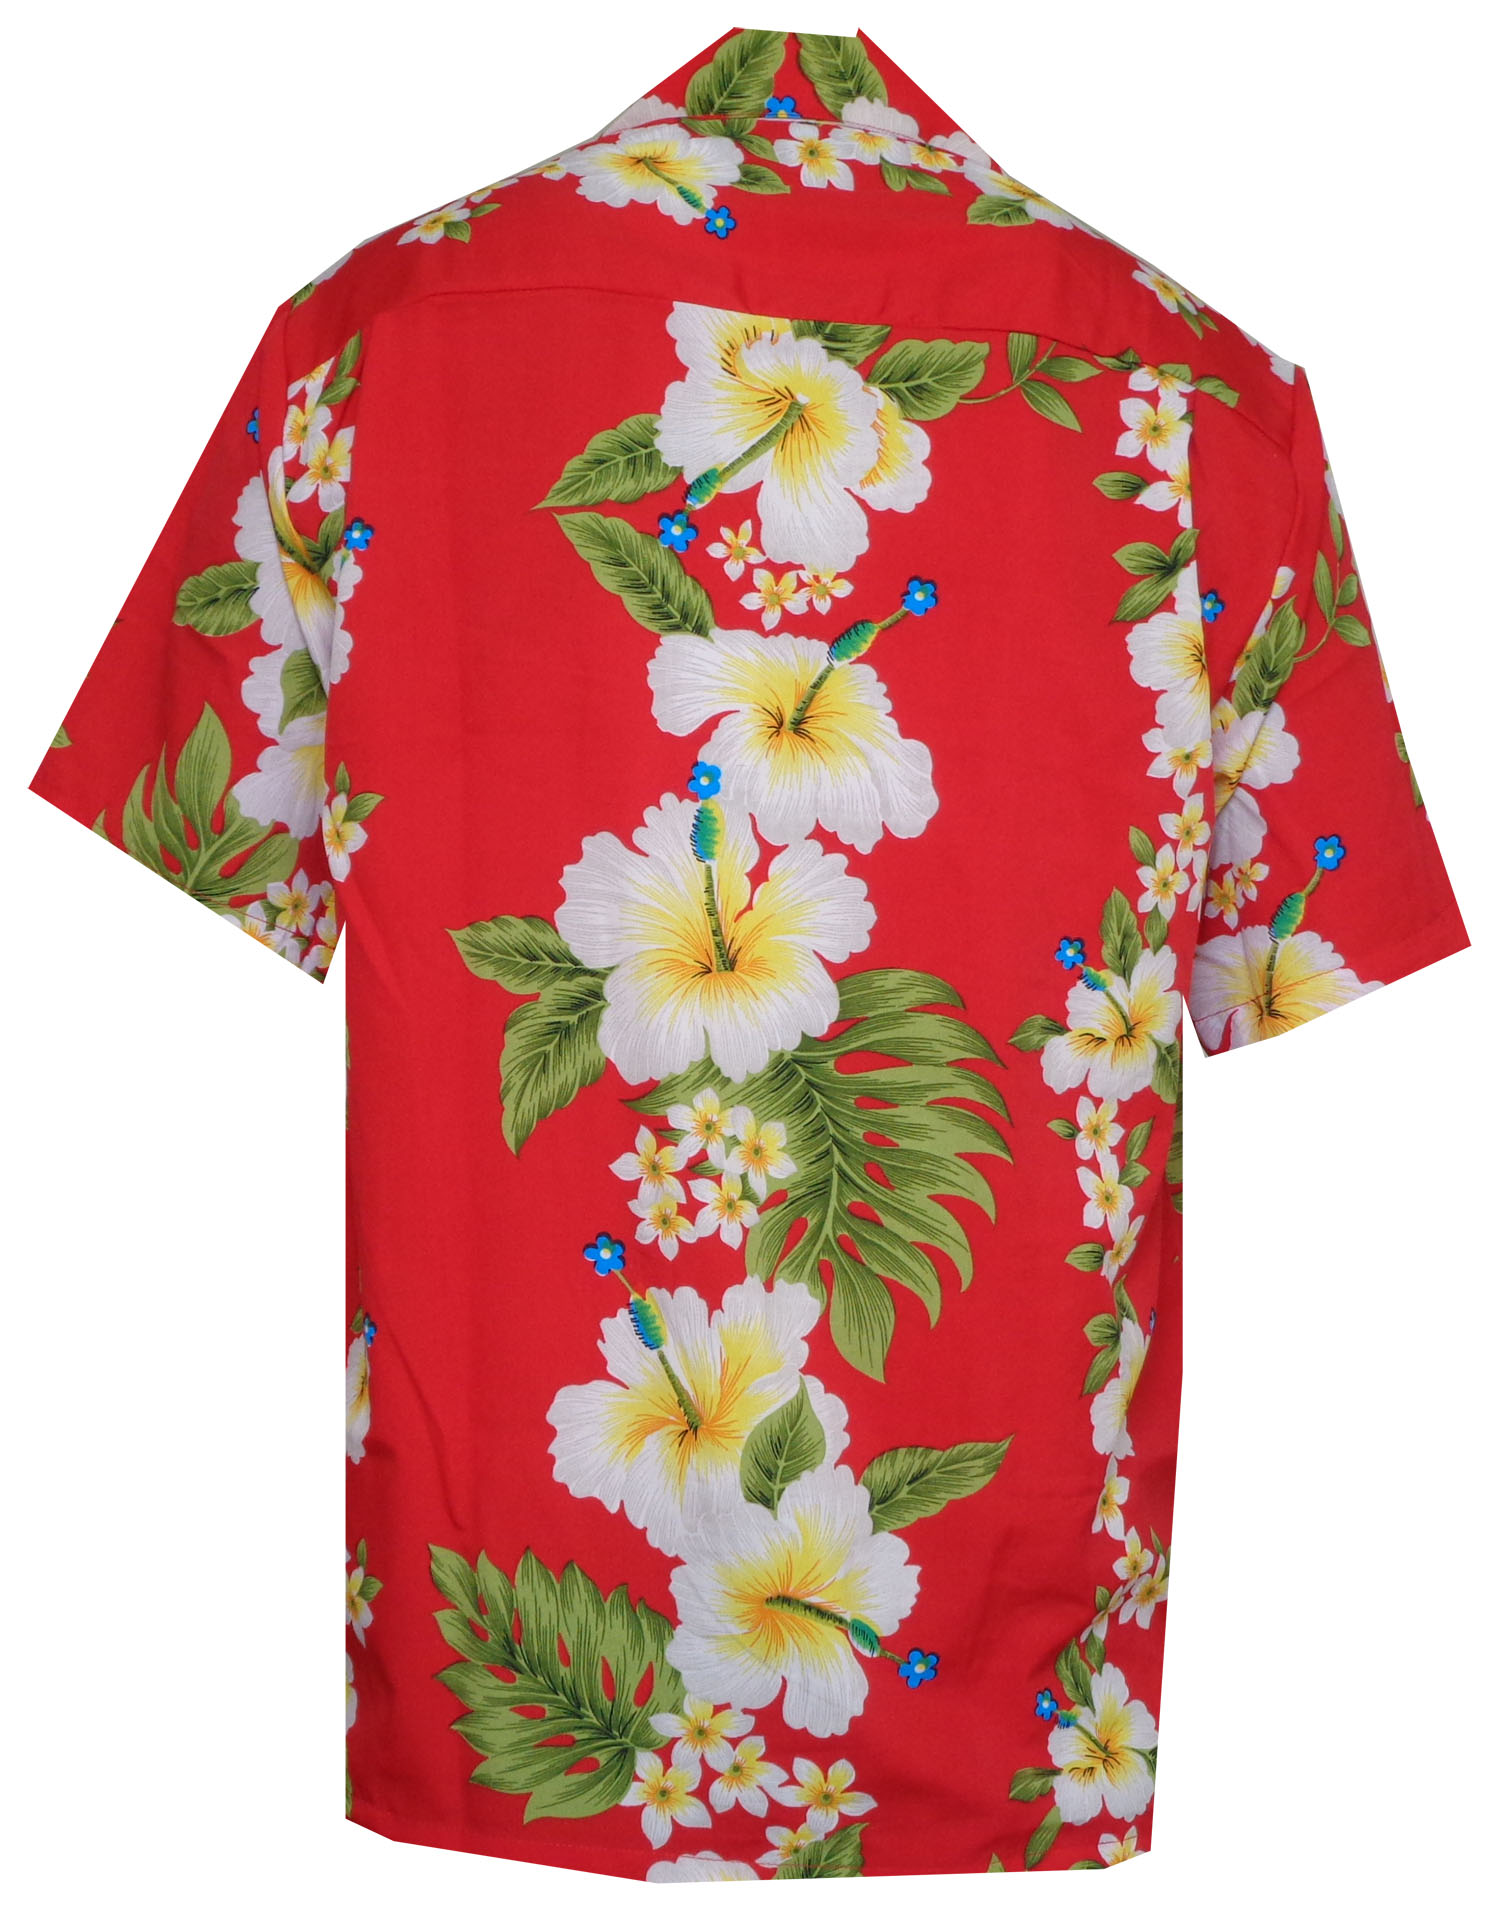 Hawaiian-Shirts-Mens-Hibiscus-Flower-Print-Beach-Party-Aloha thumbnail 10